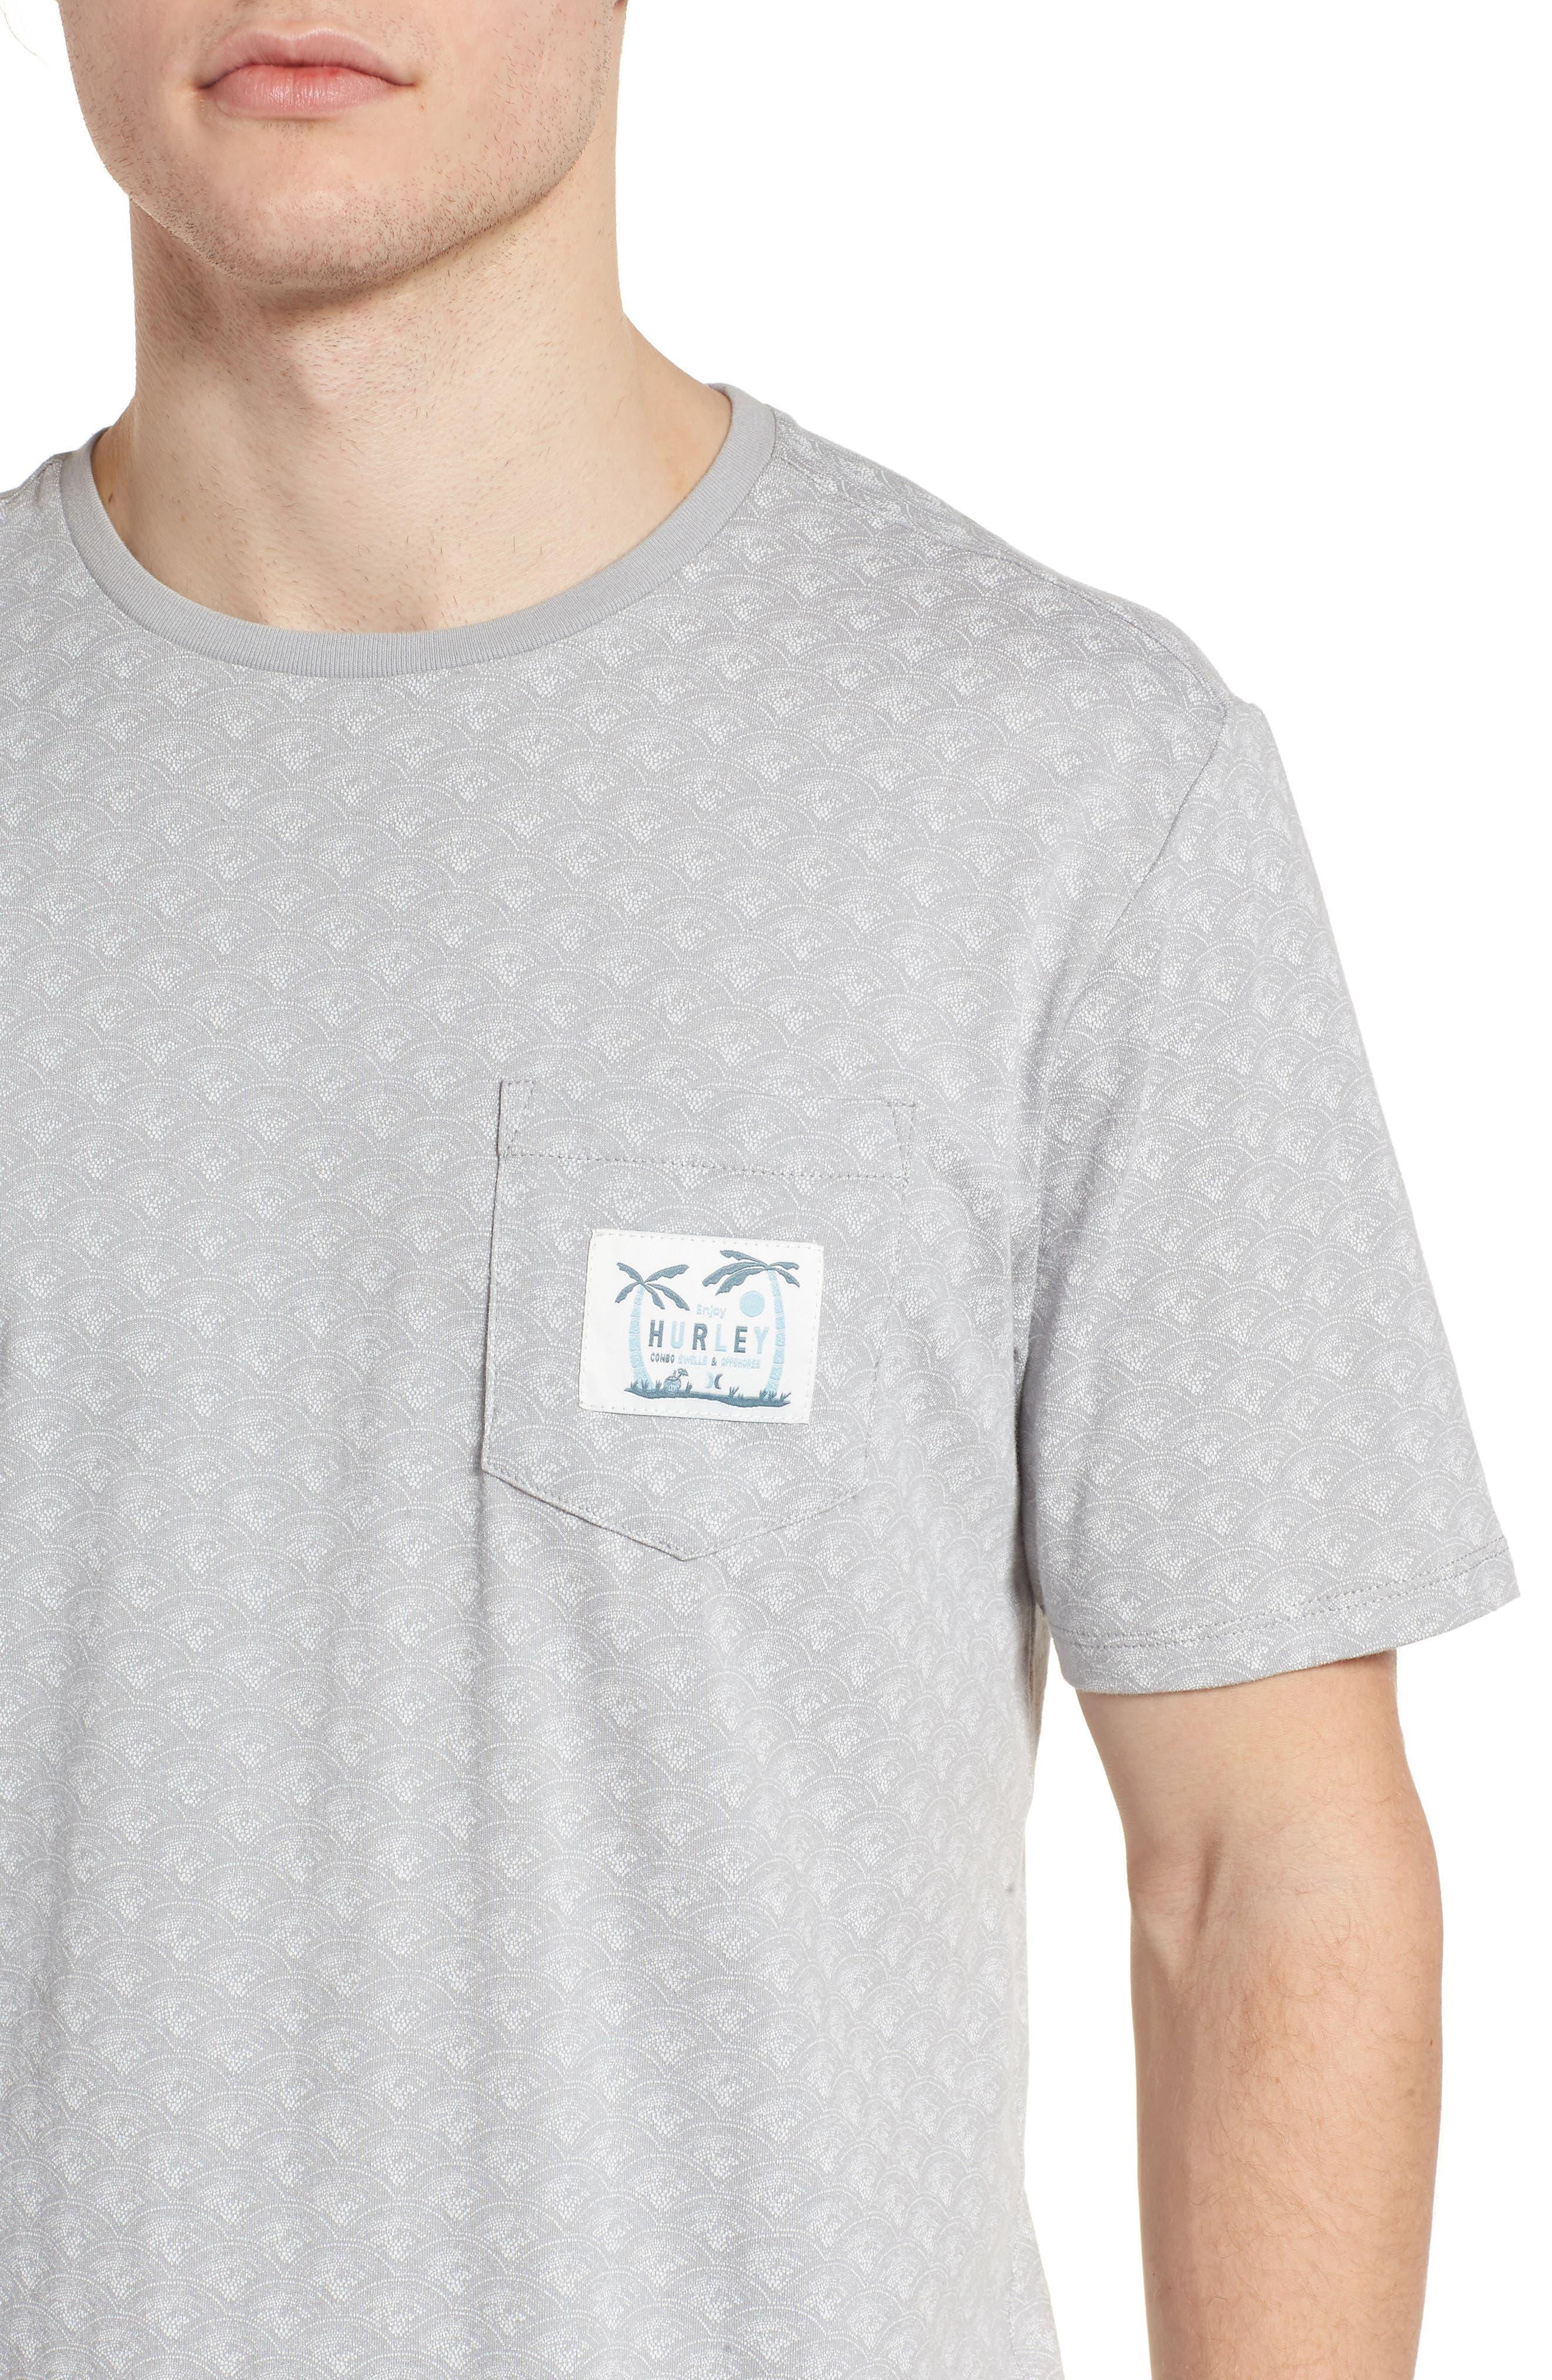 Pescado Short Sleeve T-Shirt,                             Alternate thumbnail 4, color,                             Sail